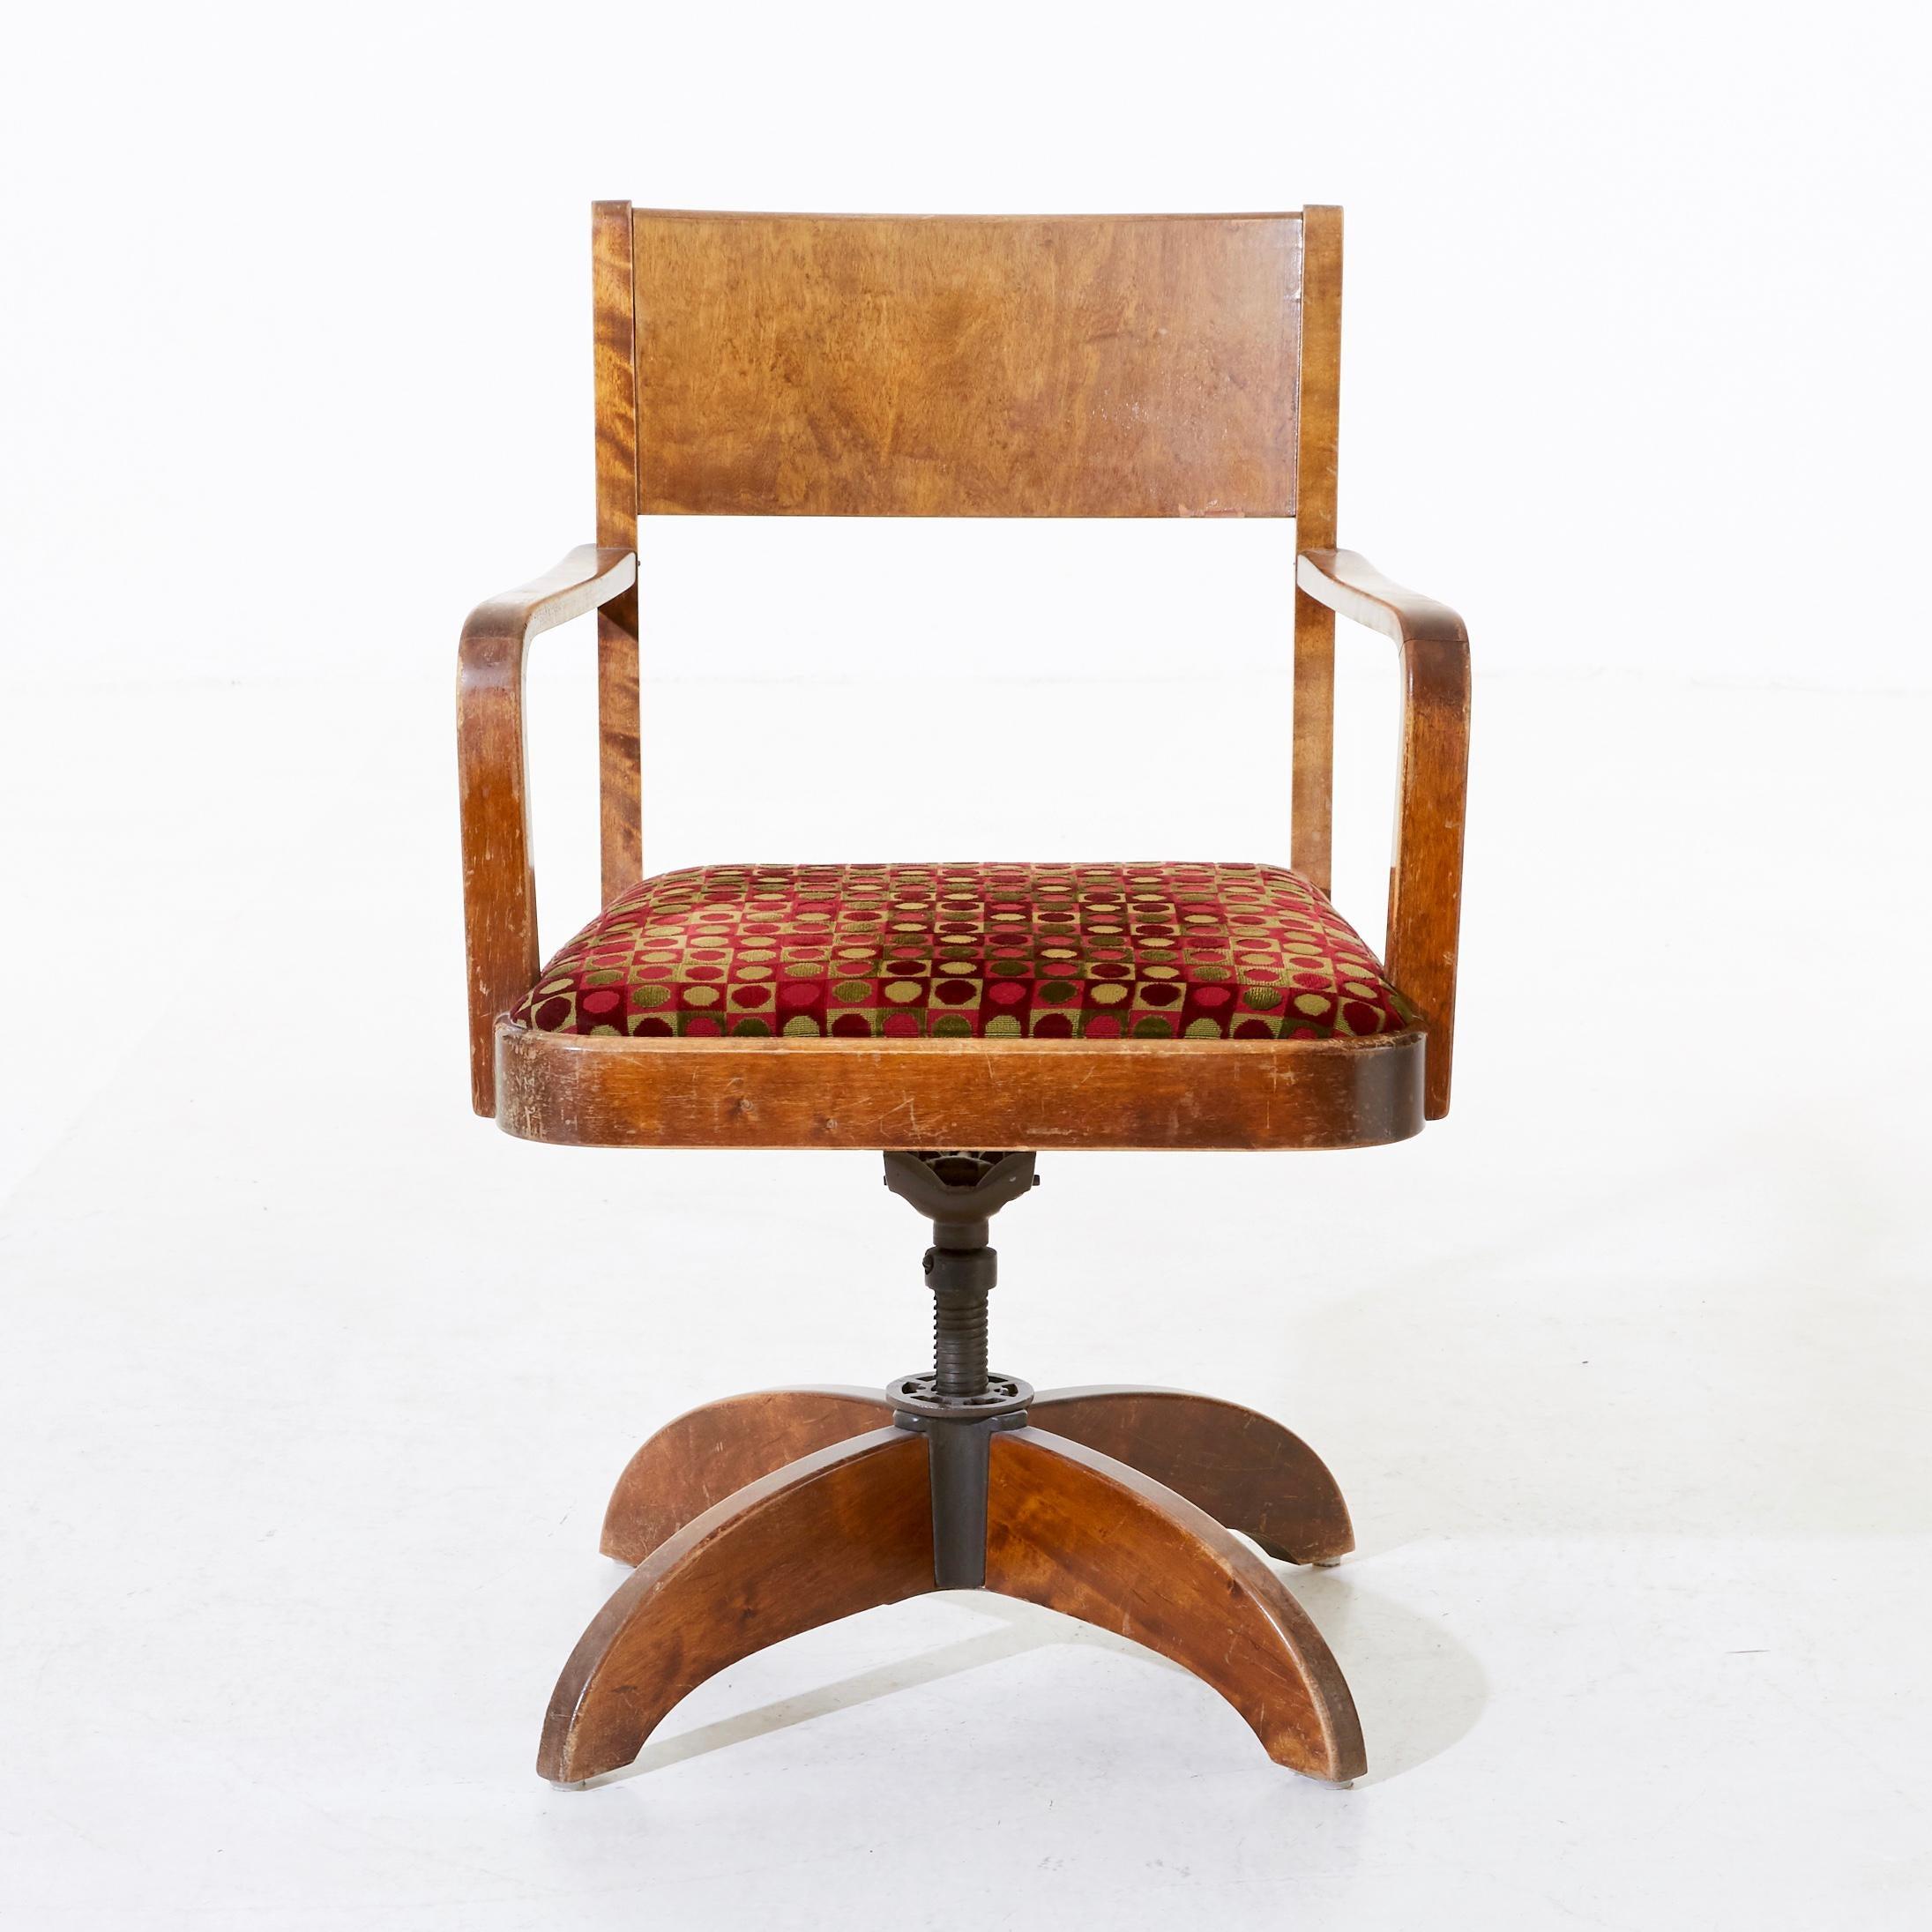 Swedish Art Deco Swivel Chair By G Ericsson For Royal